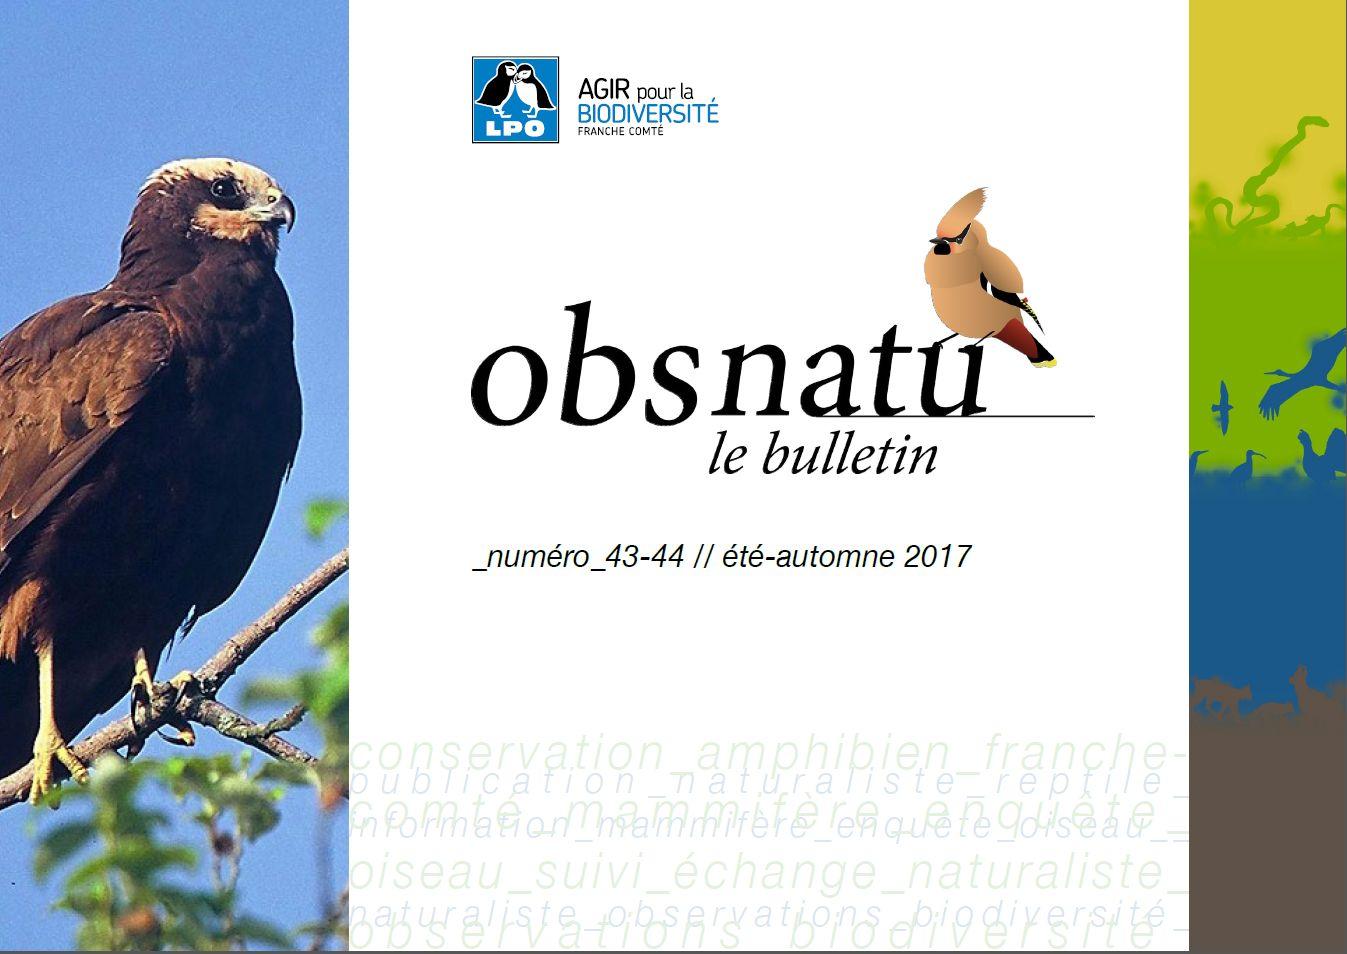 http://files.biolovision.net/franche-comte.lpo.fr/userfiles/publications/Obsnatubulls/Obsnatn43-44ete-aut2017couv.pdf.jpg